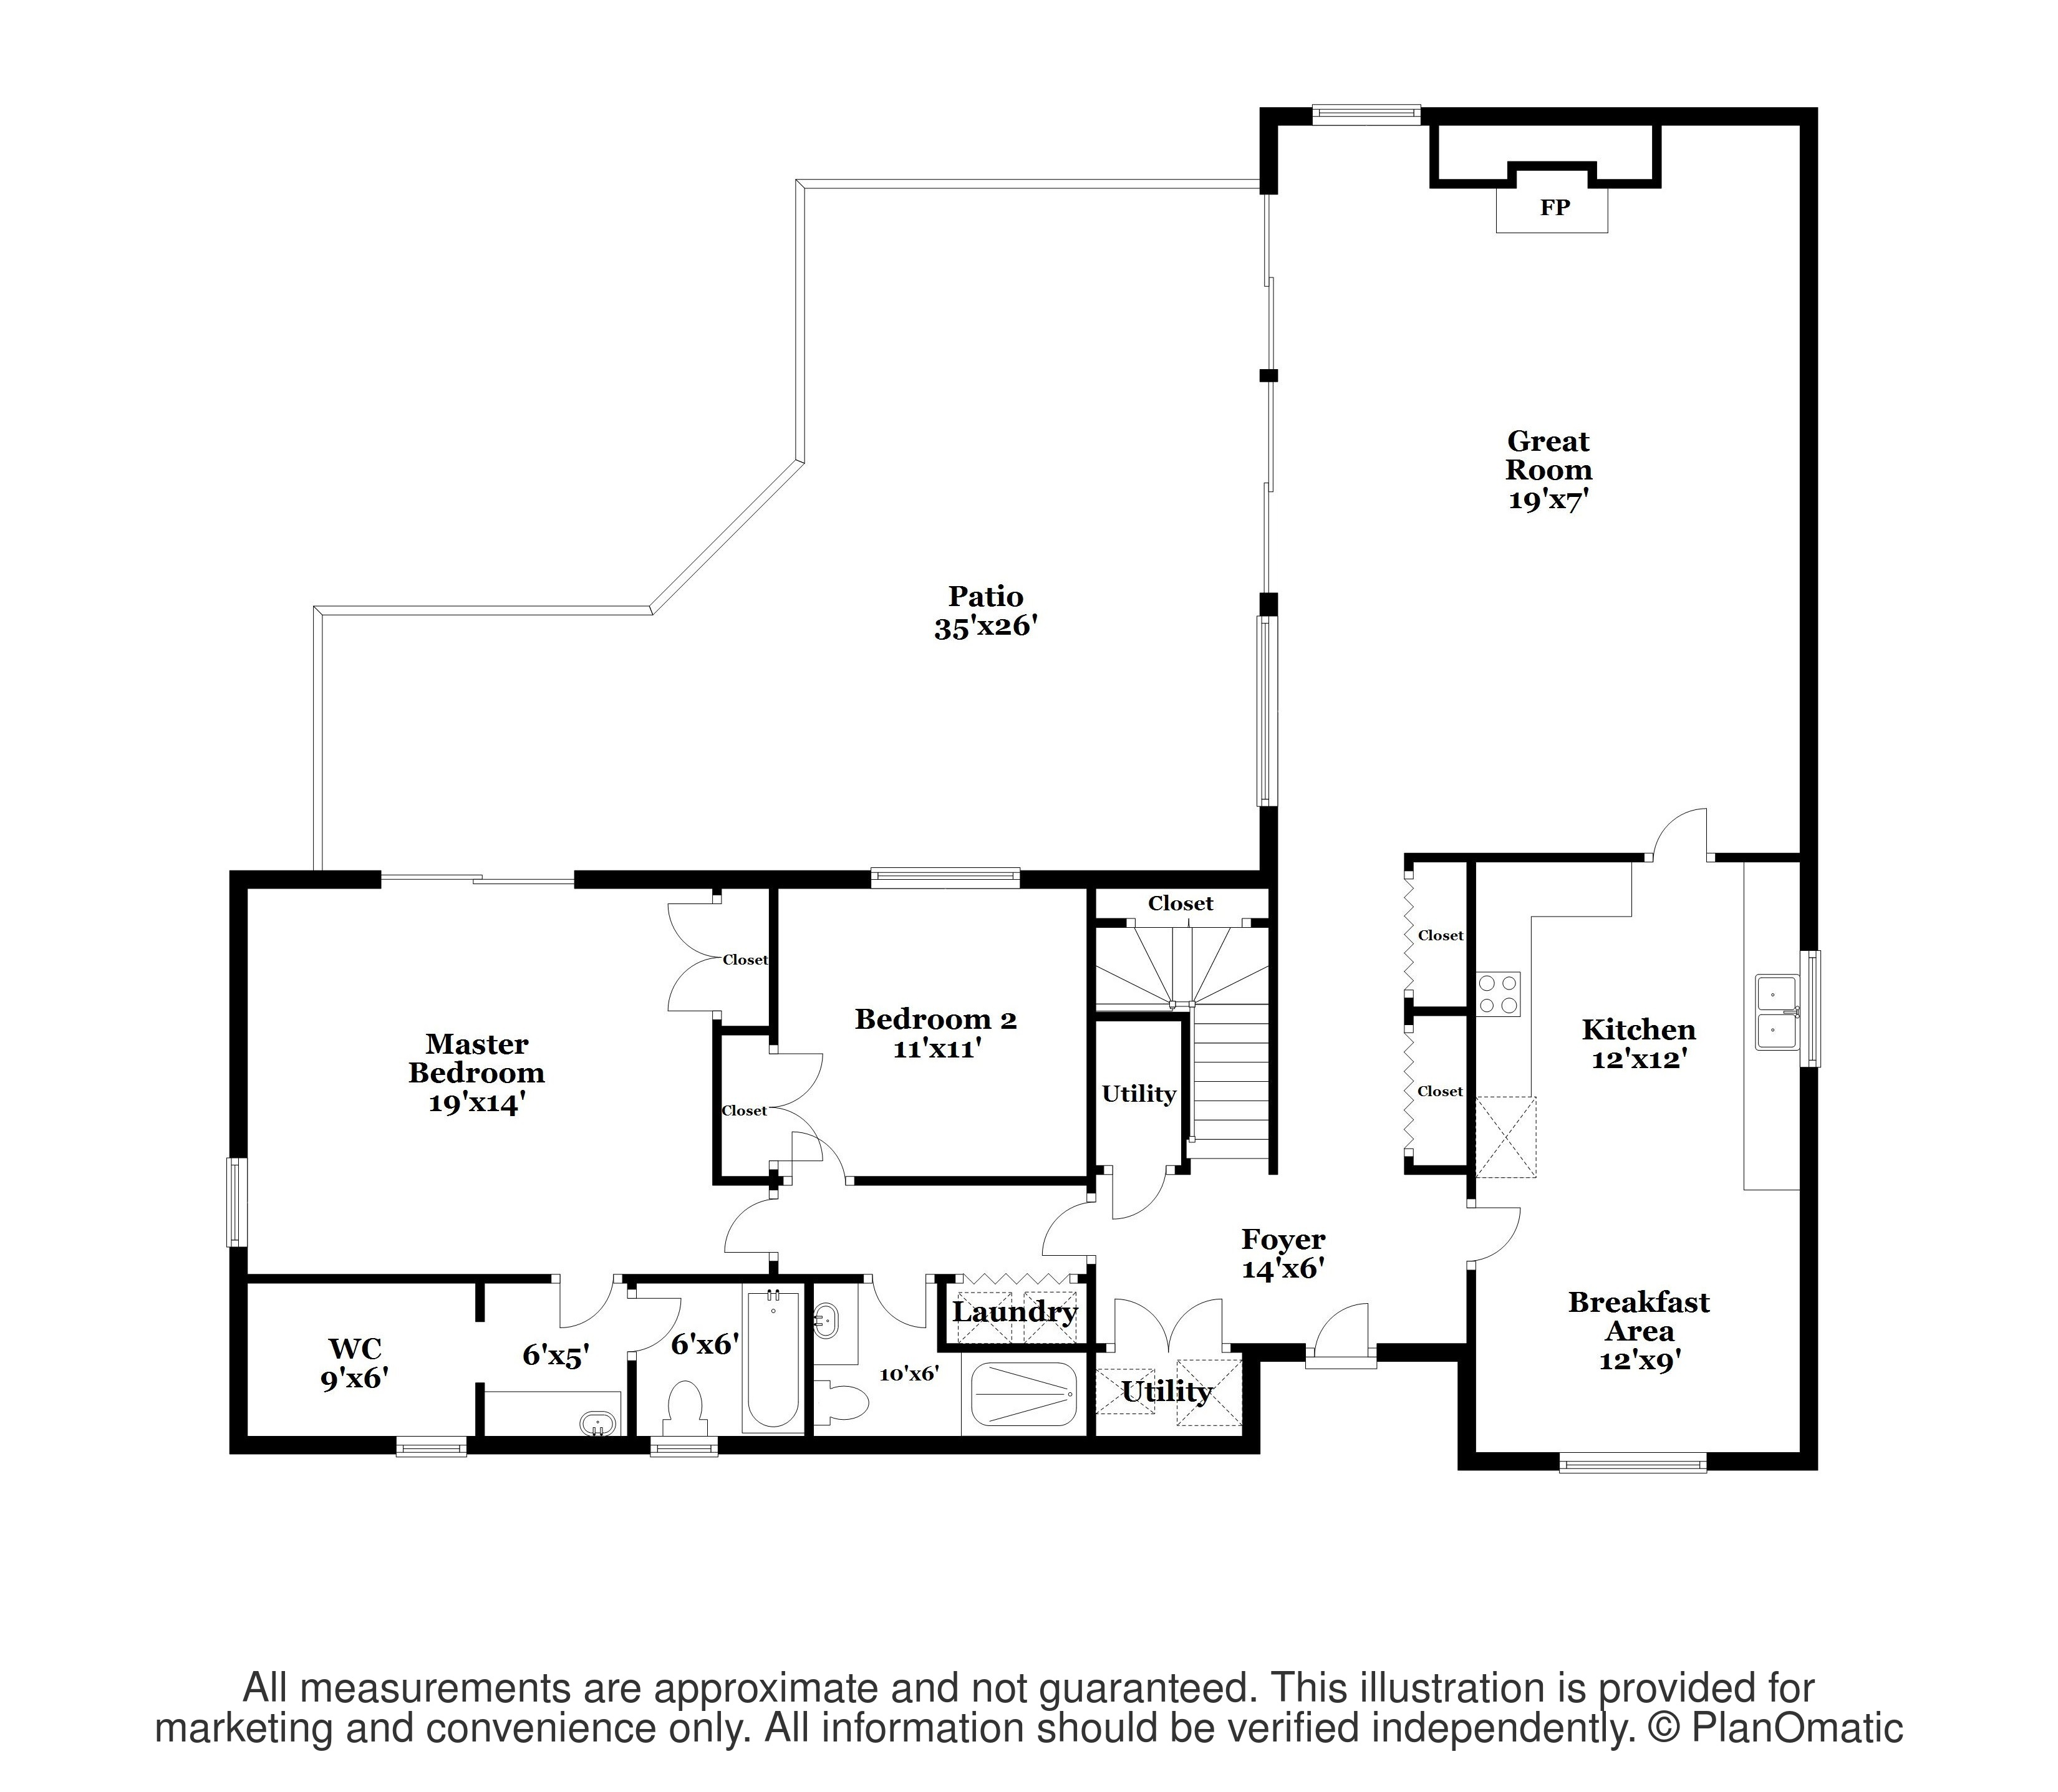 Single Family Homes для того Продажа на Tailor-Made for Entertaining in Constitution Hill 29 Constitution Hill West, Princeton, Нью-Джерси 08540 Соединенные Штаты